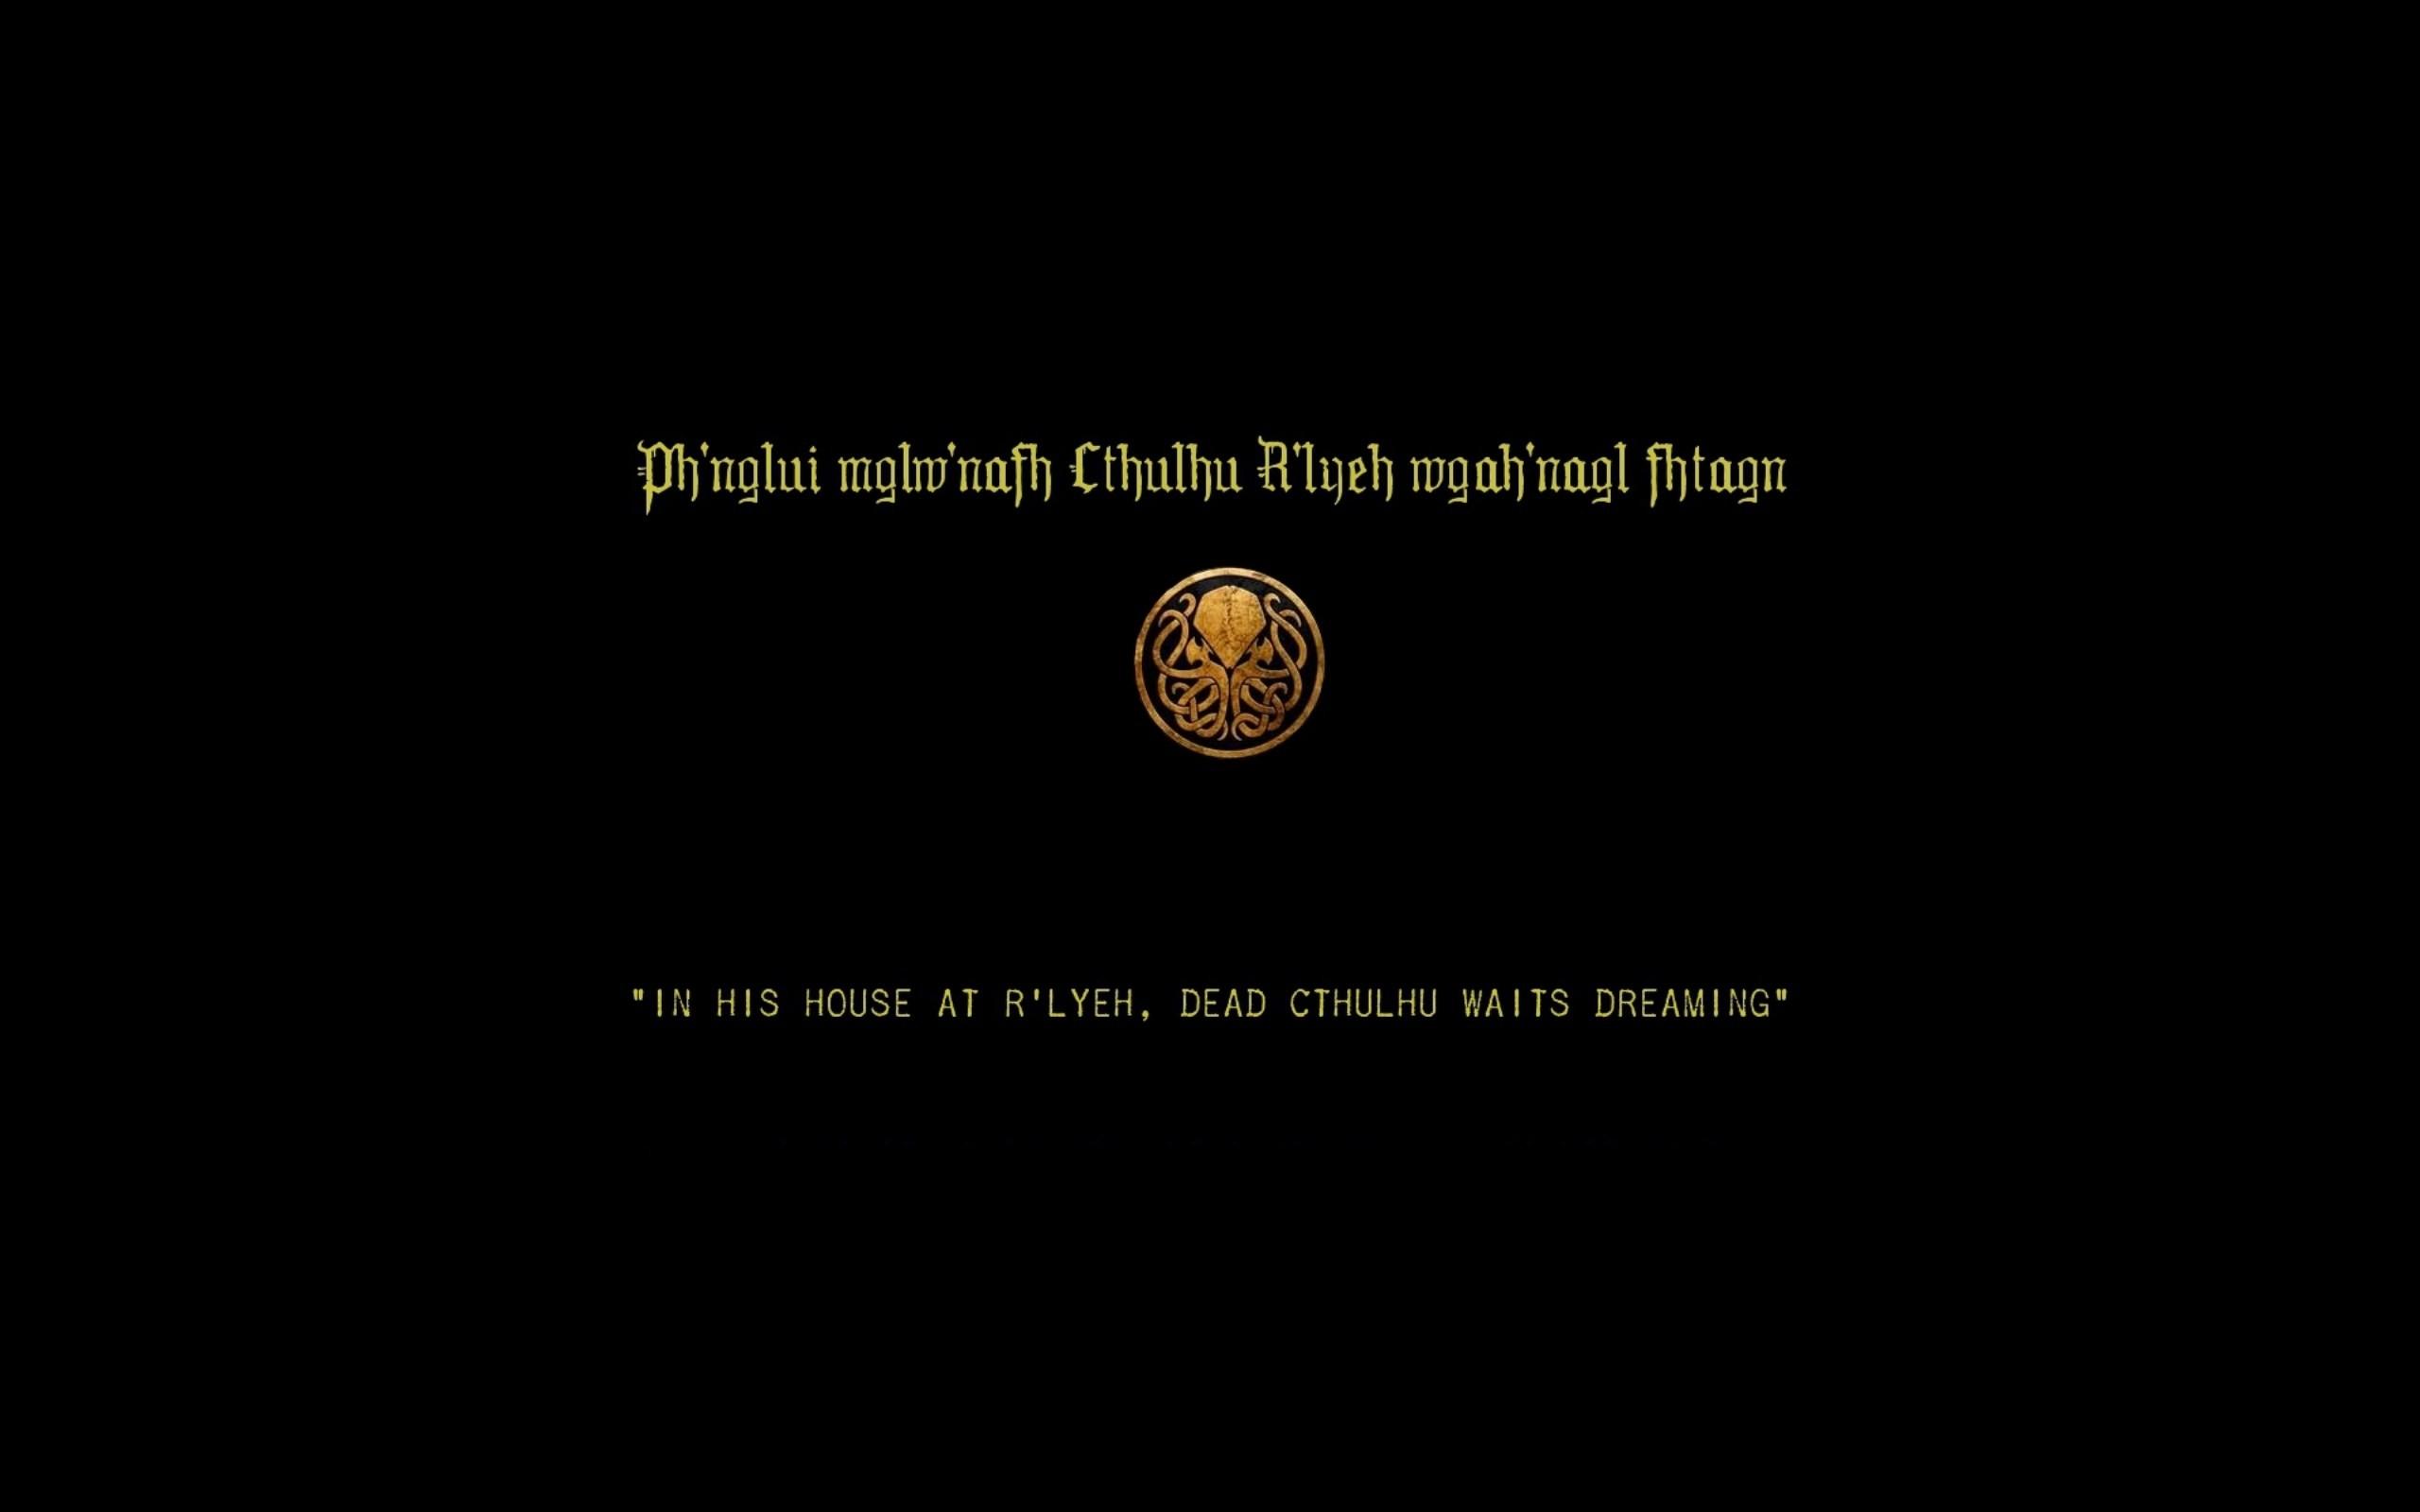 Get Minimalist Lovecraft Wallpaper Images